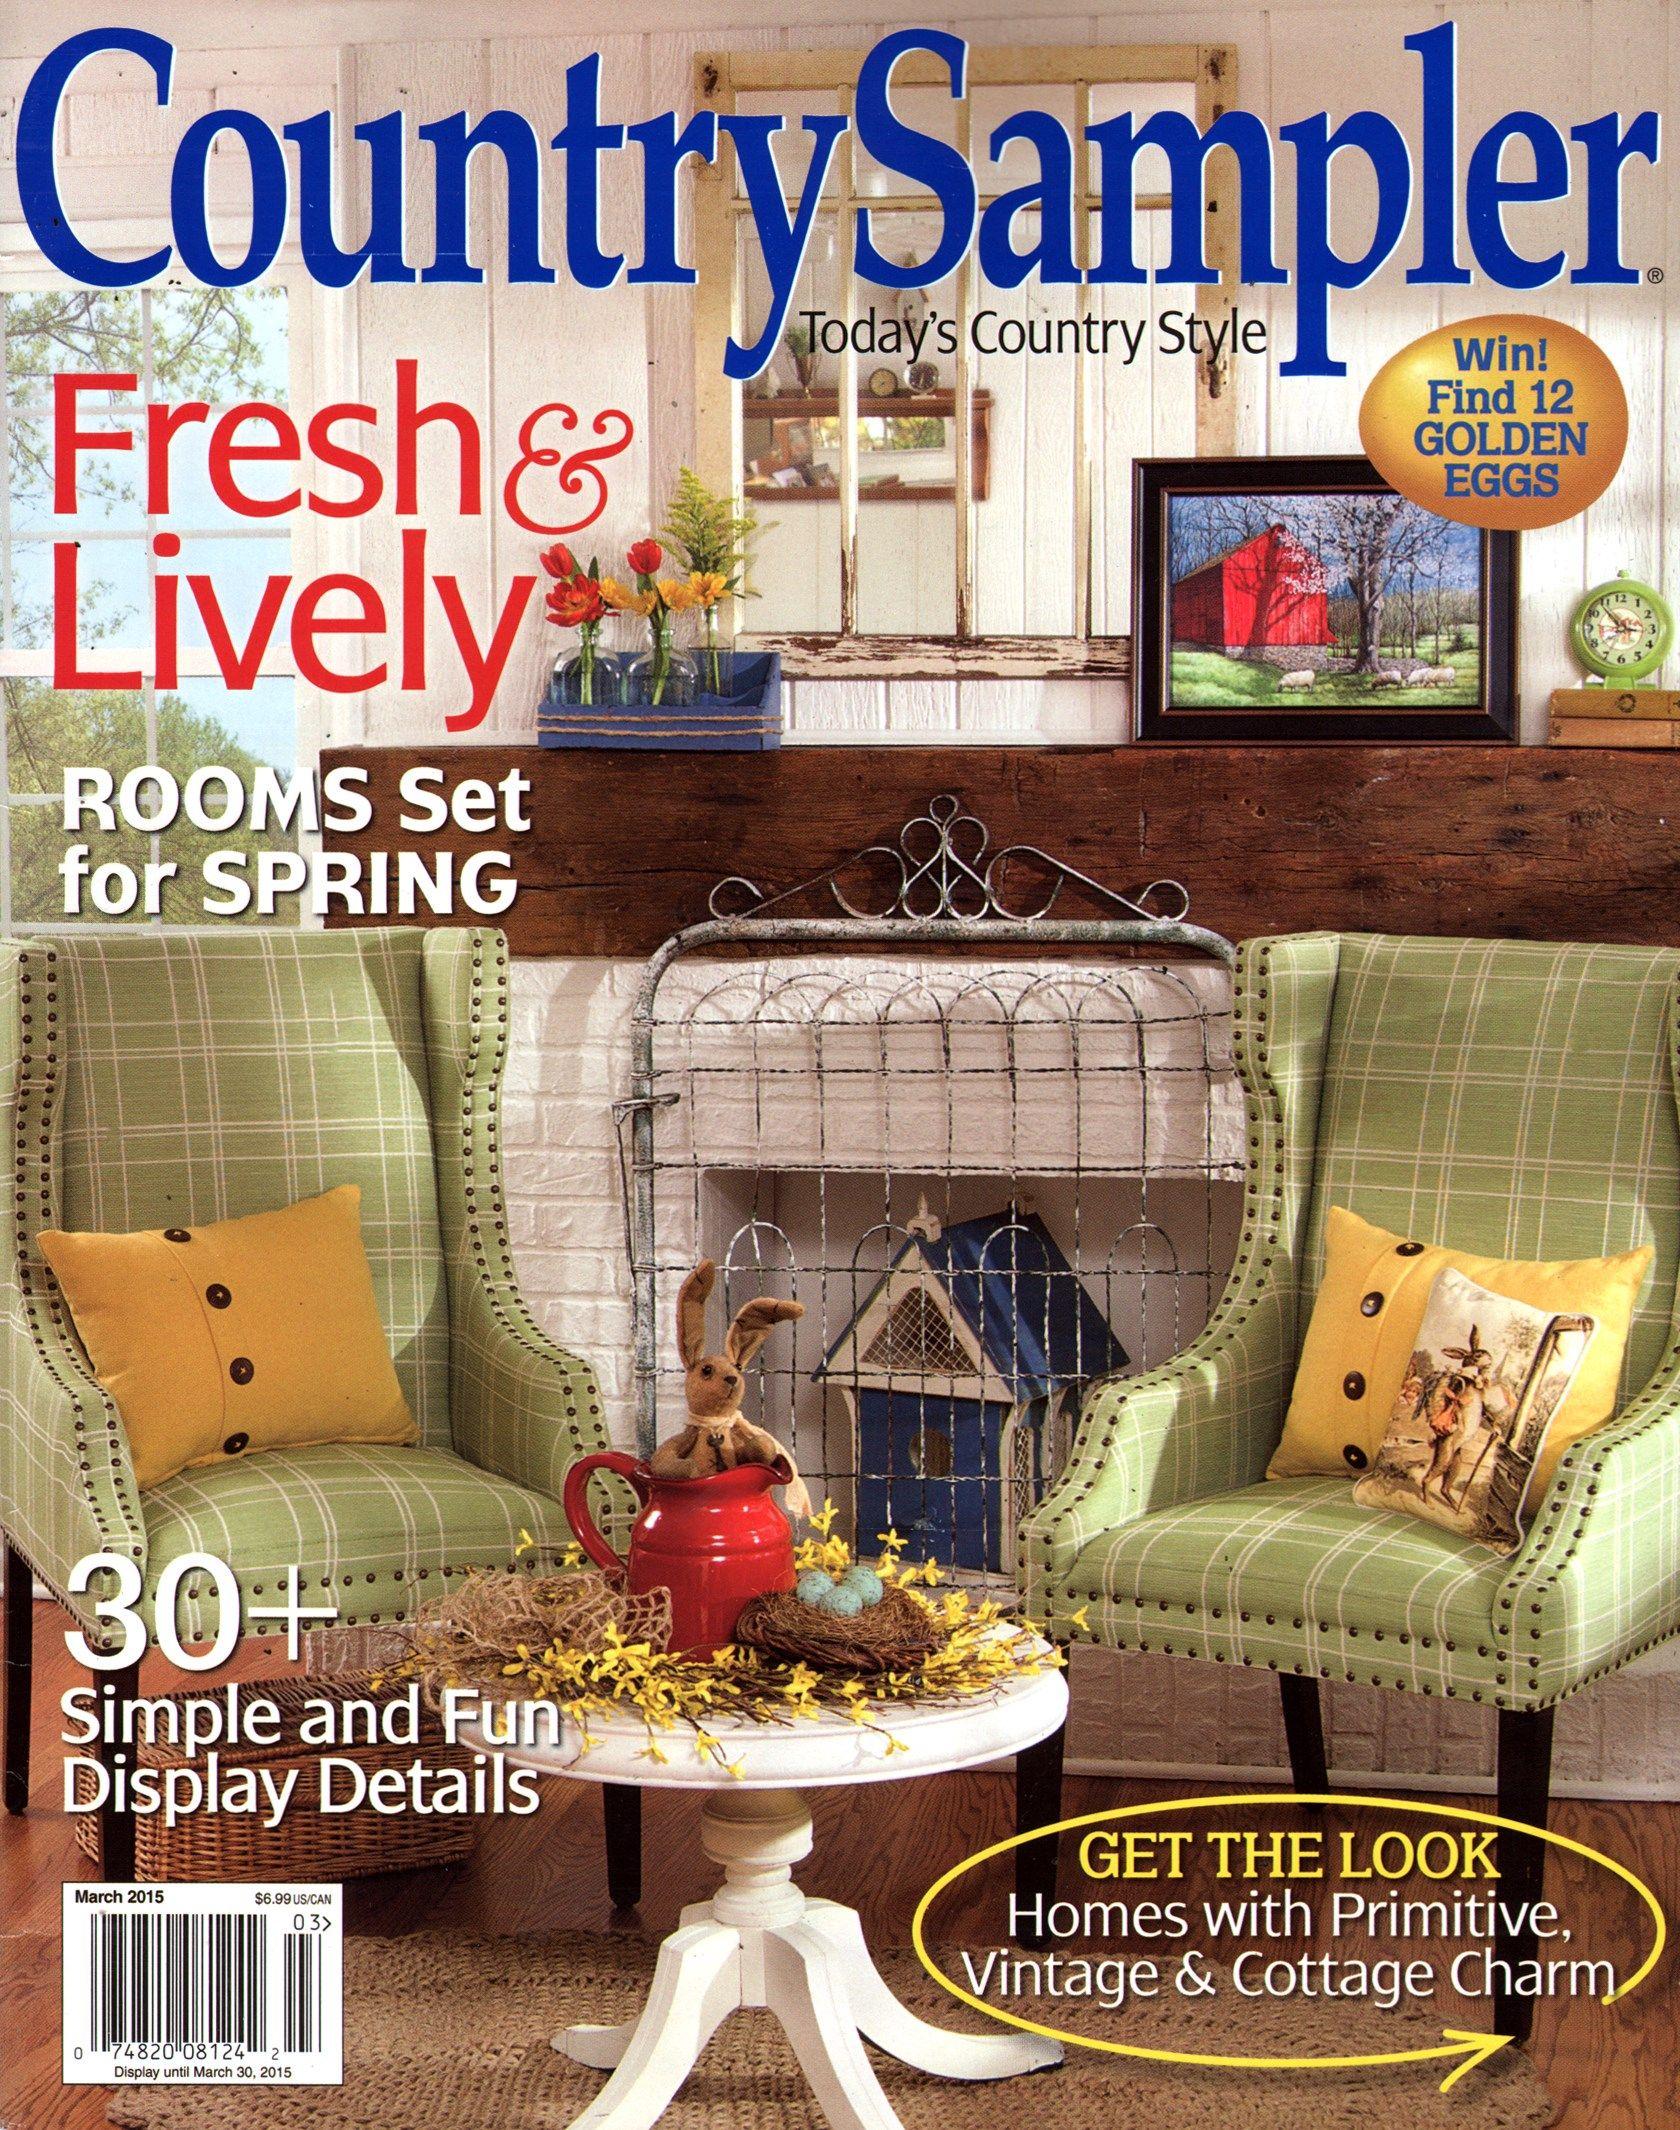 Country Sampler Cover for 3/1/2015 Country sampler